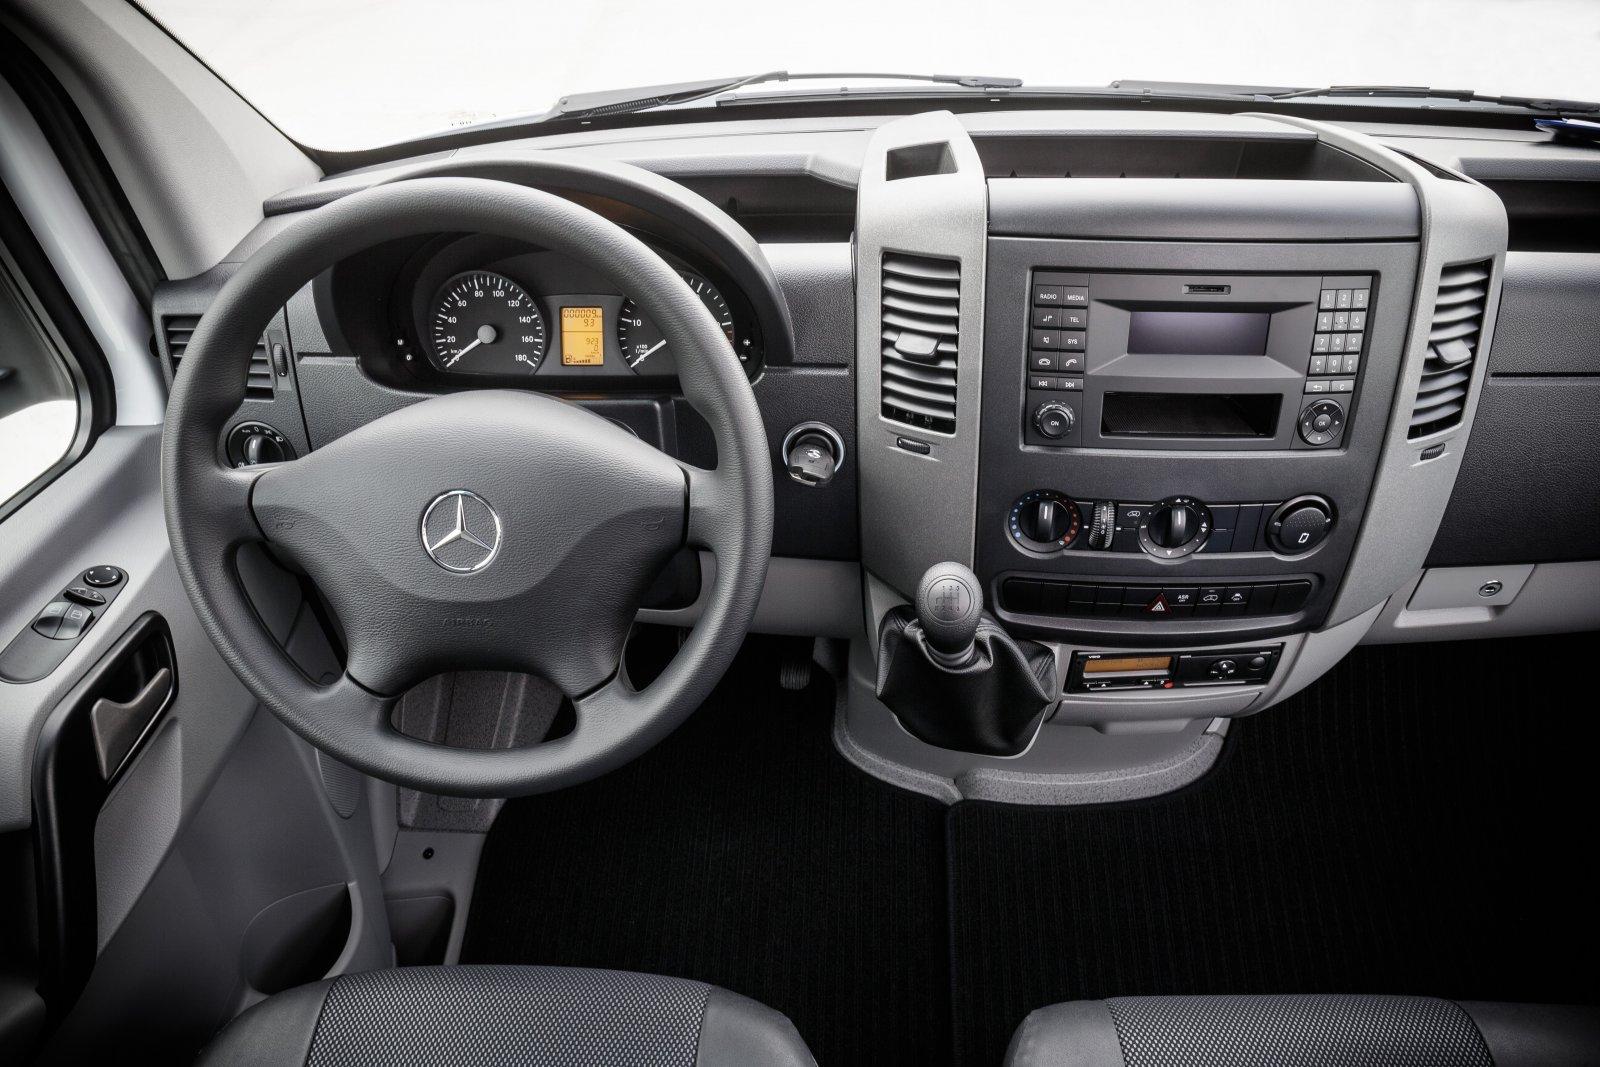 Mercedes-Benz Sprinter – 516 CDI; interiör; seat covers: tunja black; OM 651 motoreffekt 120 kW/163 hk; 6-växlad manuell växellåda Eco Gear; hjulbas: 3665 mm; totalvikt 5.5 ton